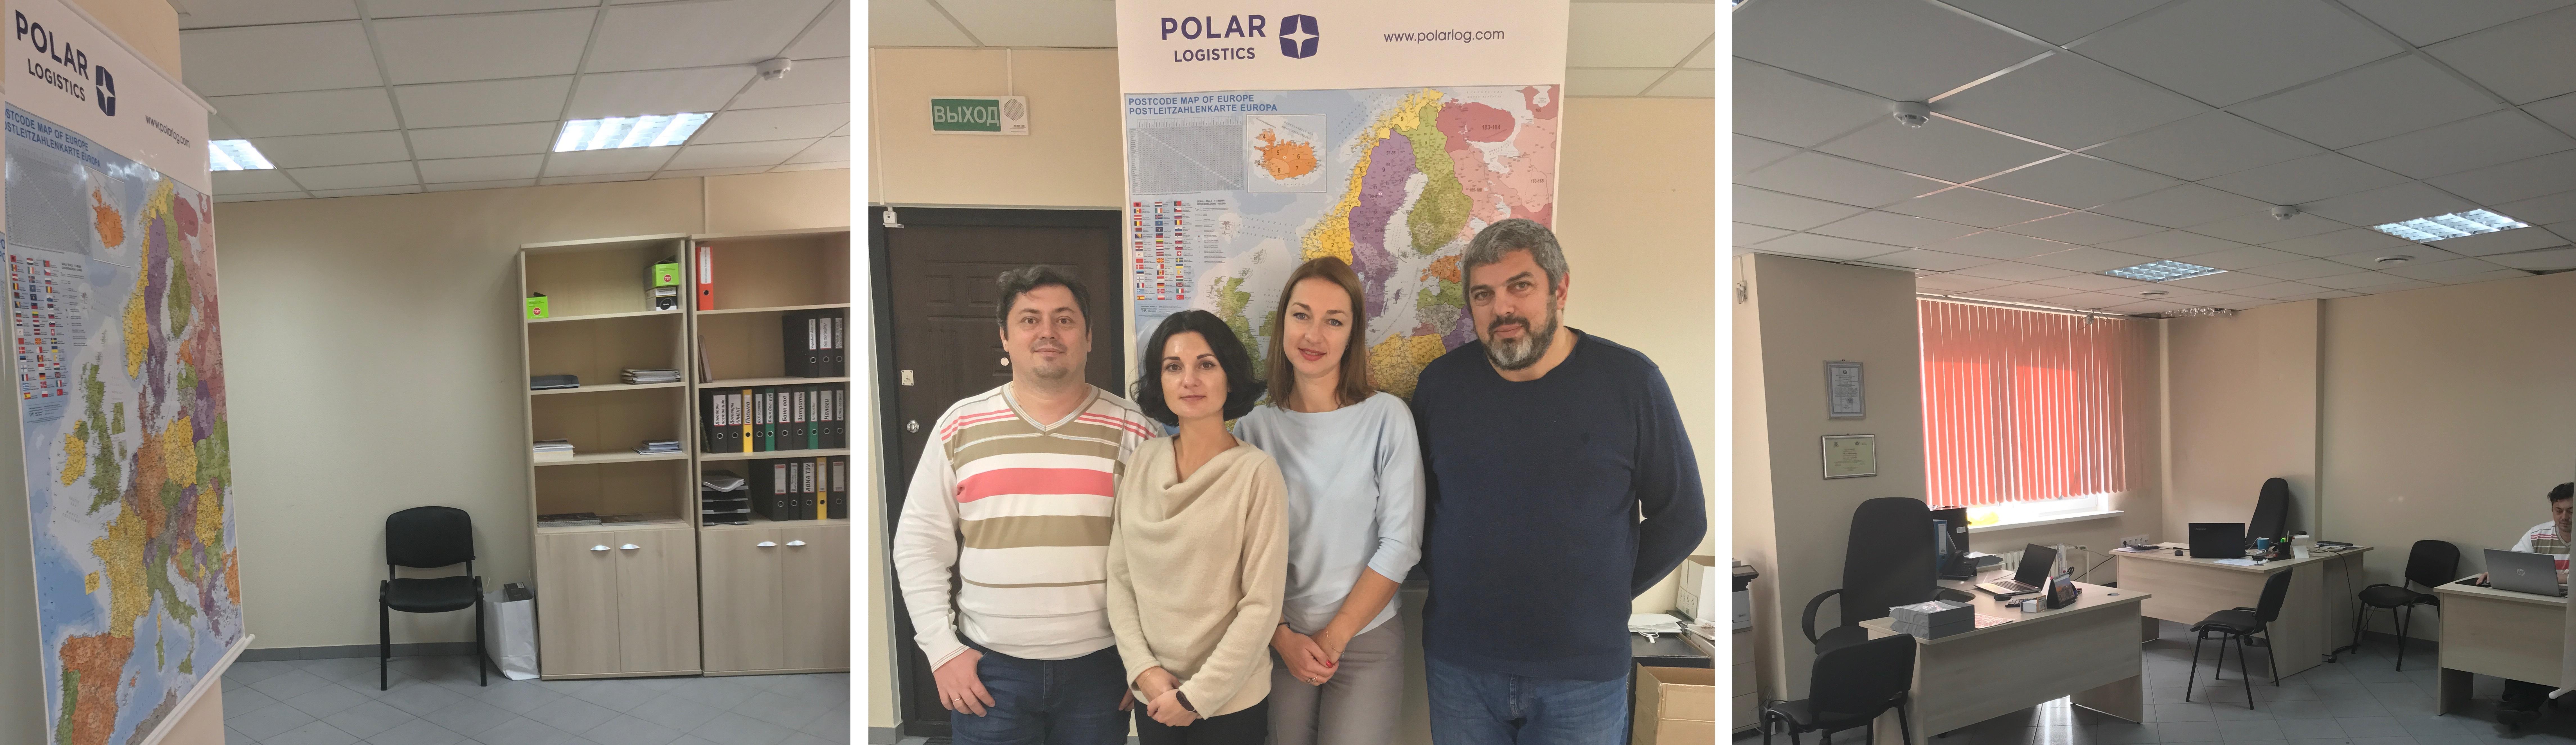 Coop_Polar